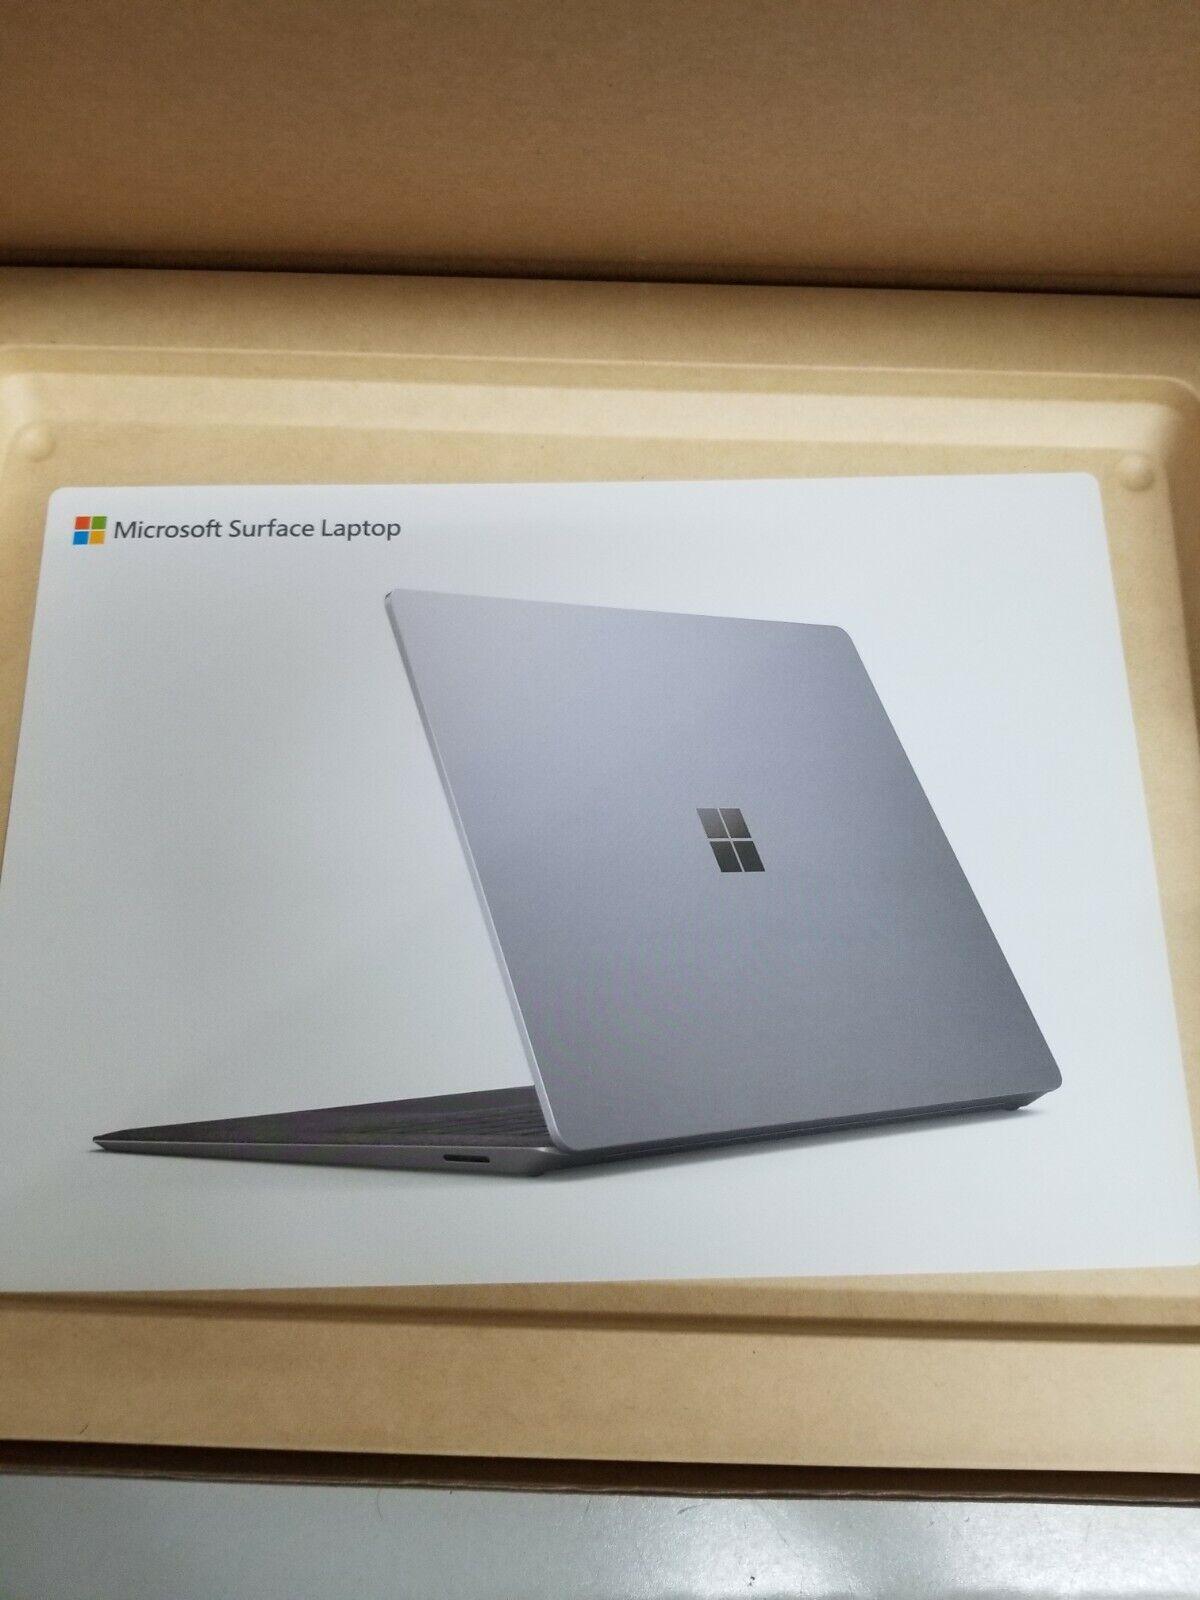 "Microsoft Surface Laptop 3 13.5"" Intel Core i5-1035G7 8GB RAM 256GB SSD"